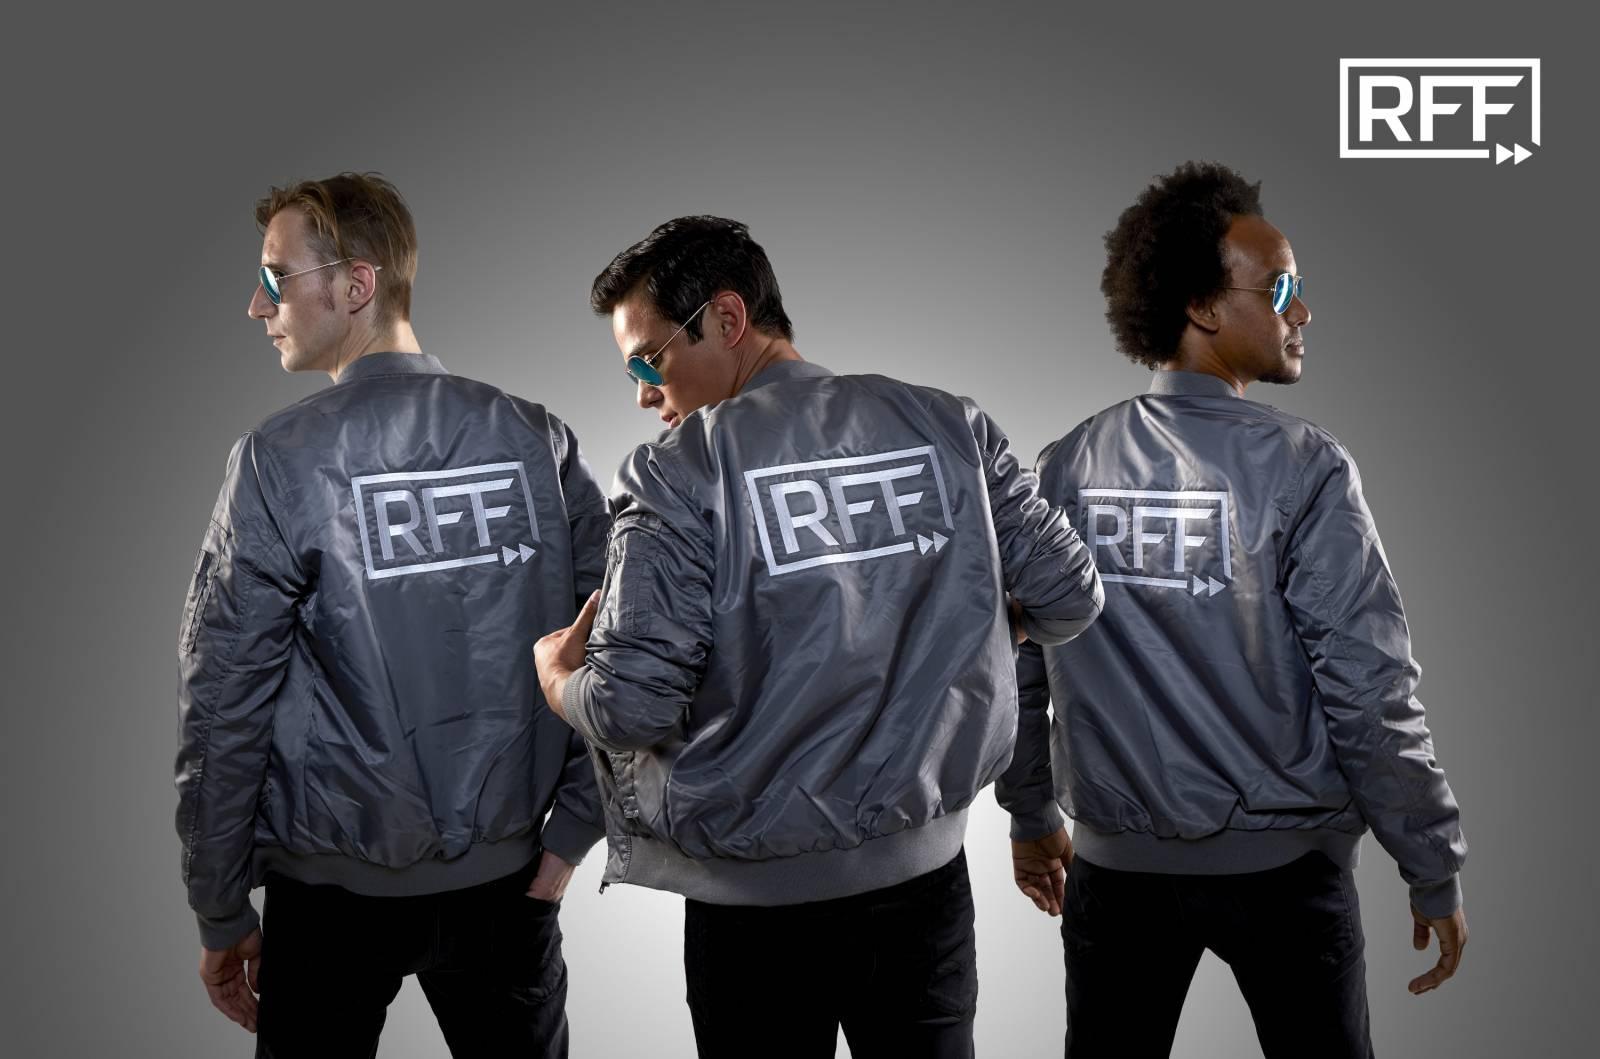 RFF artiest livemuziek entertainment house of events (2)